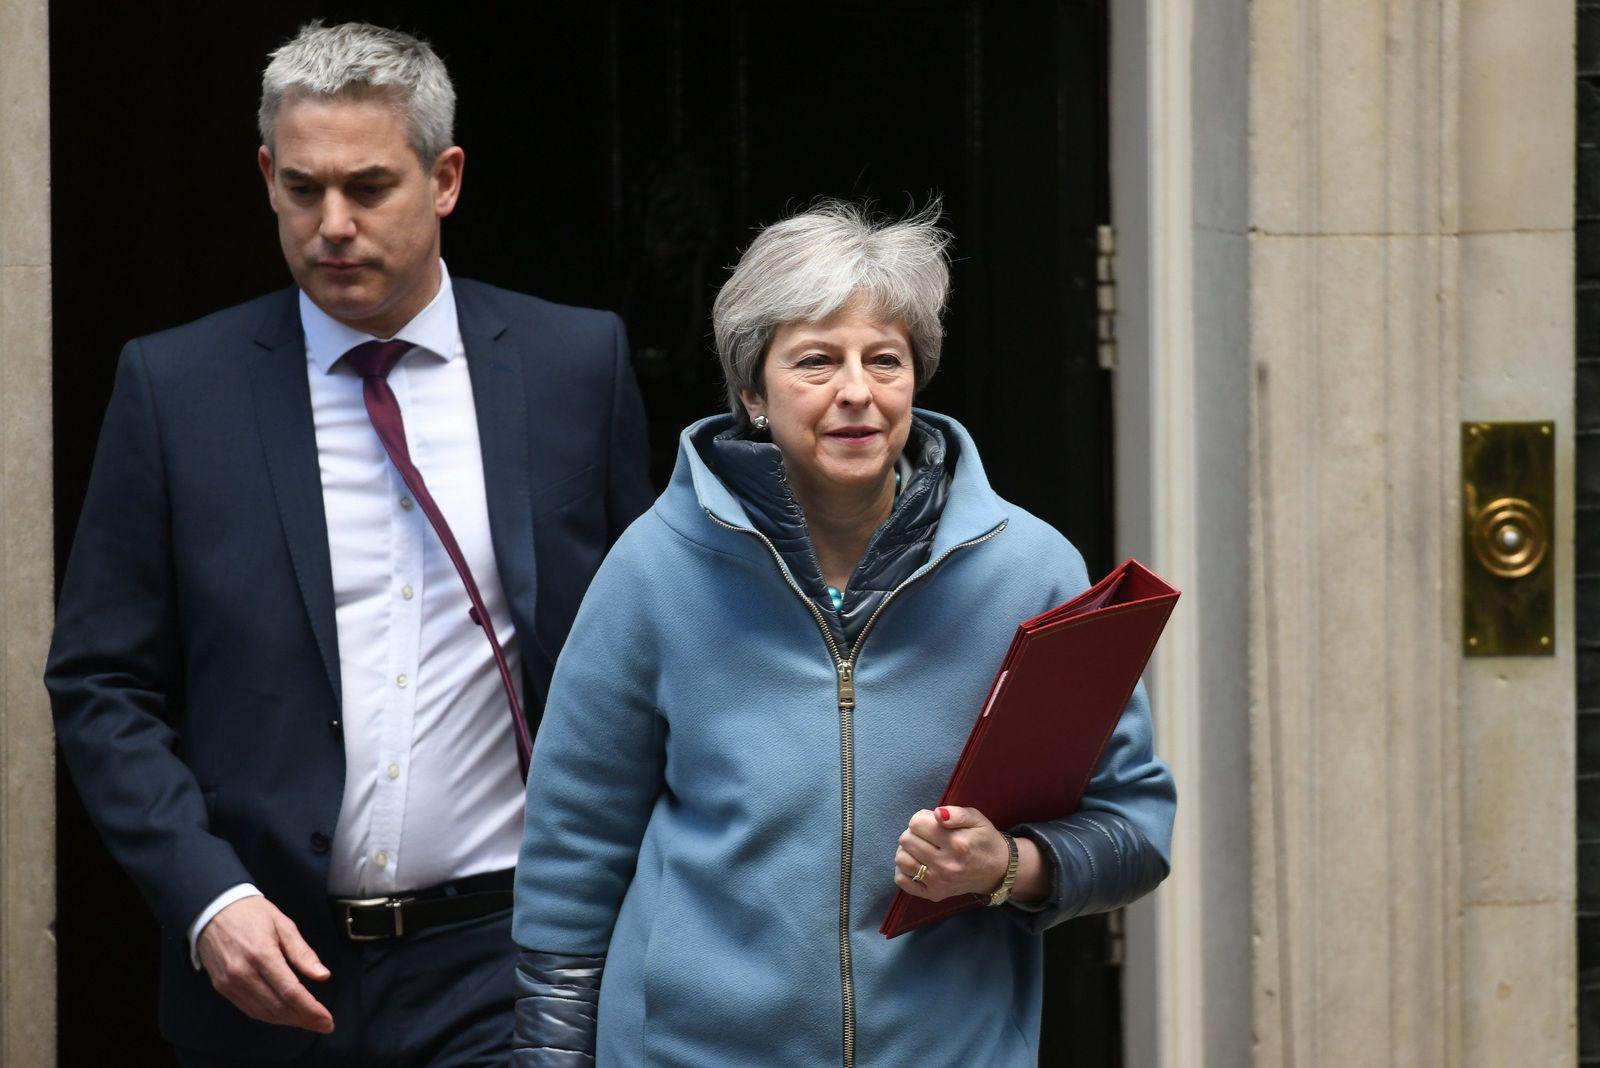 Brexit/ May/ Barclay